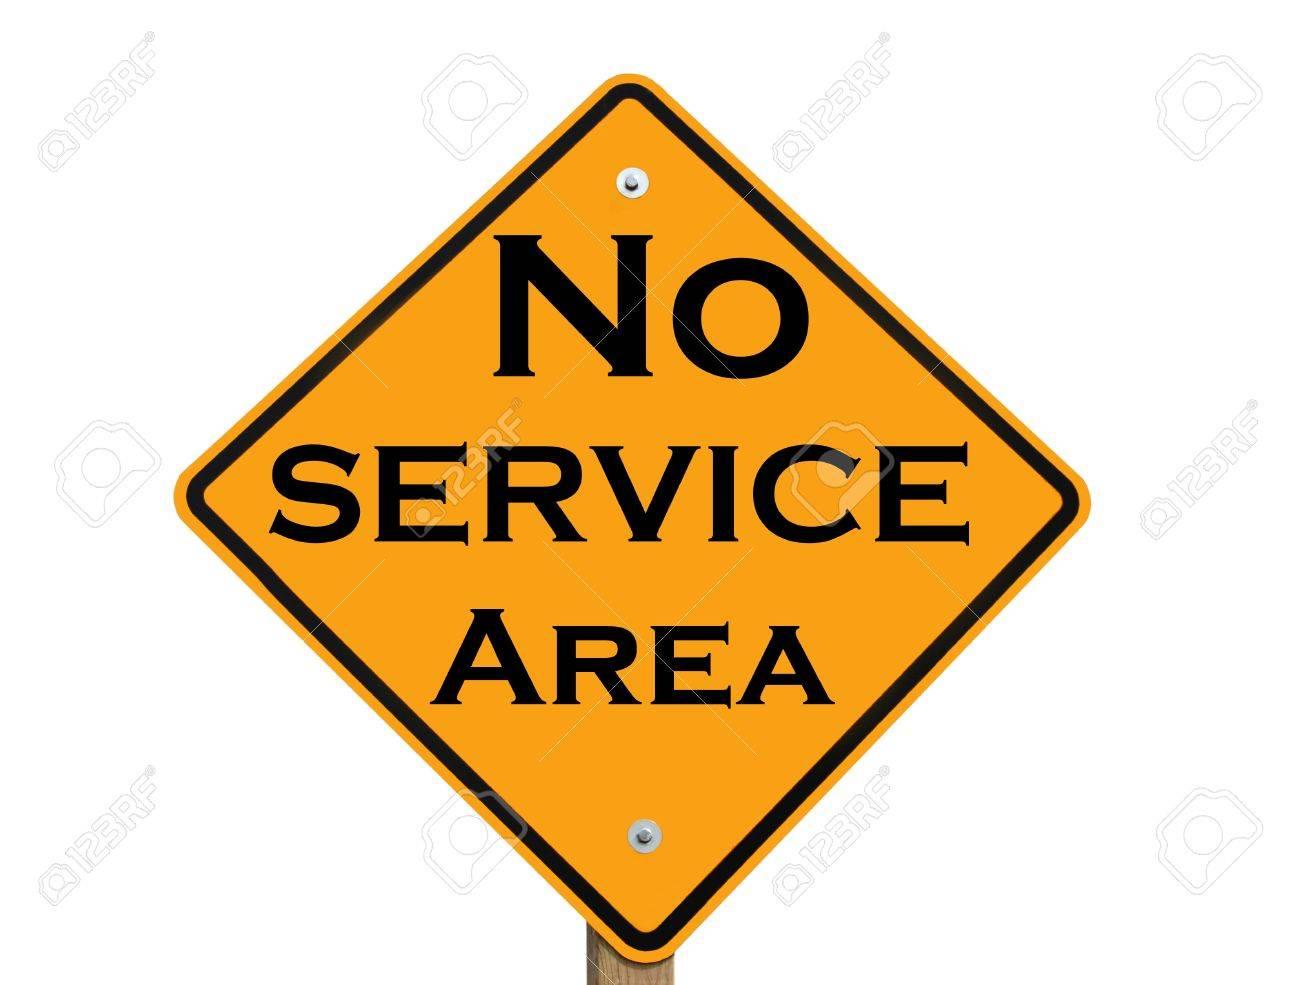 no service area warning sign Stock Photo - 8466028